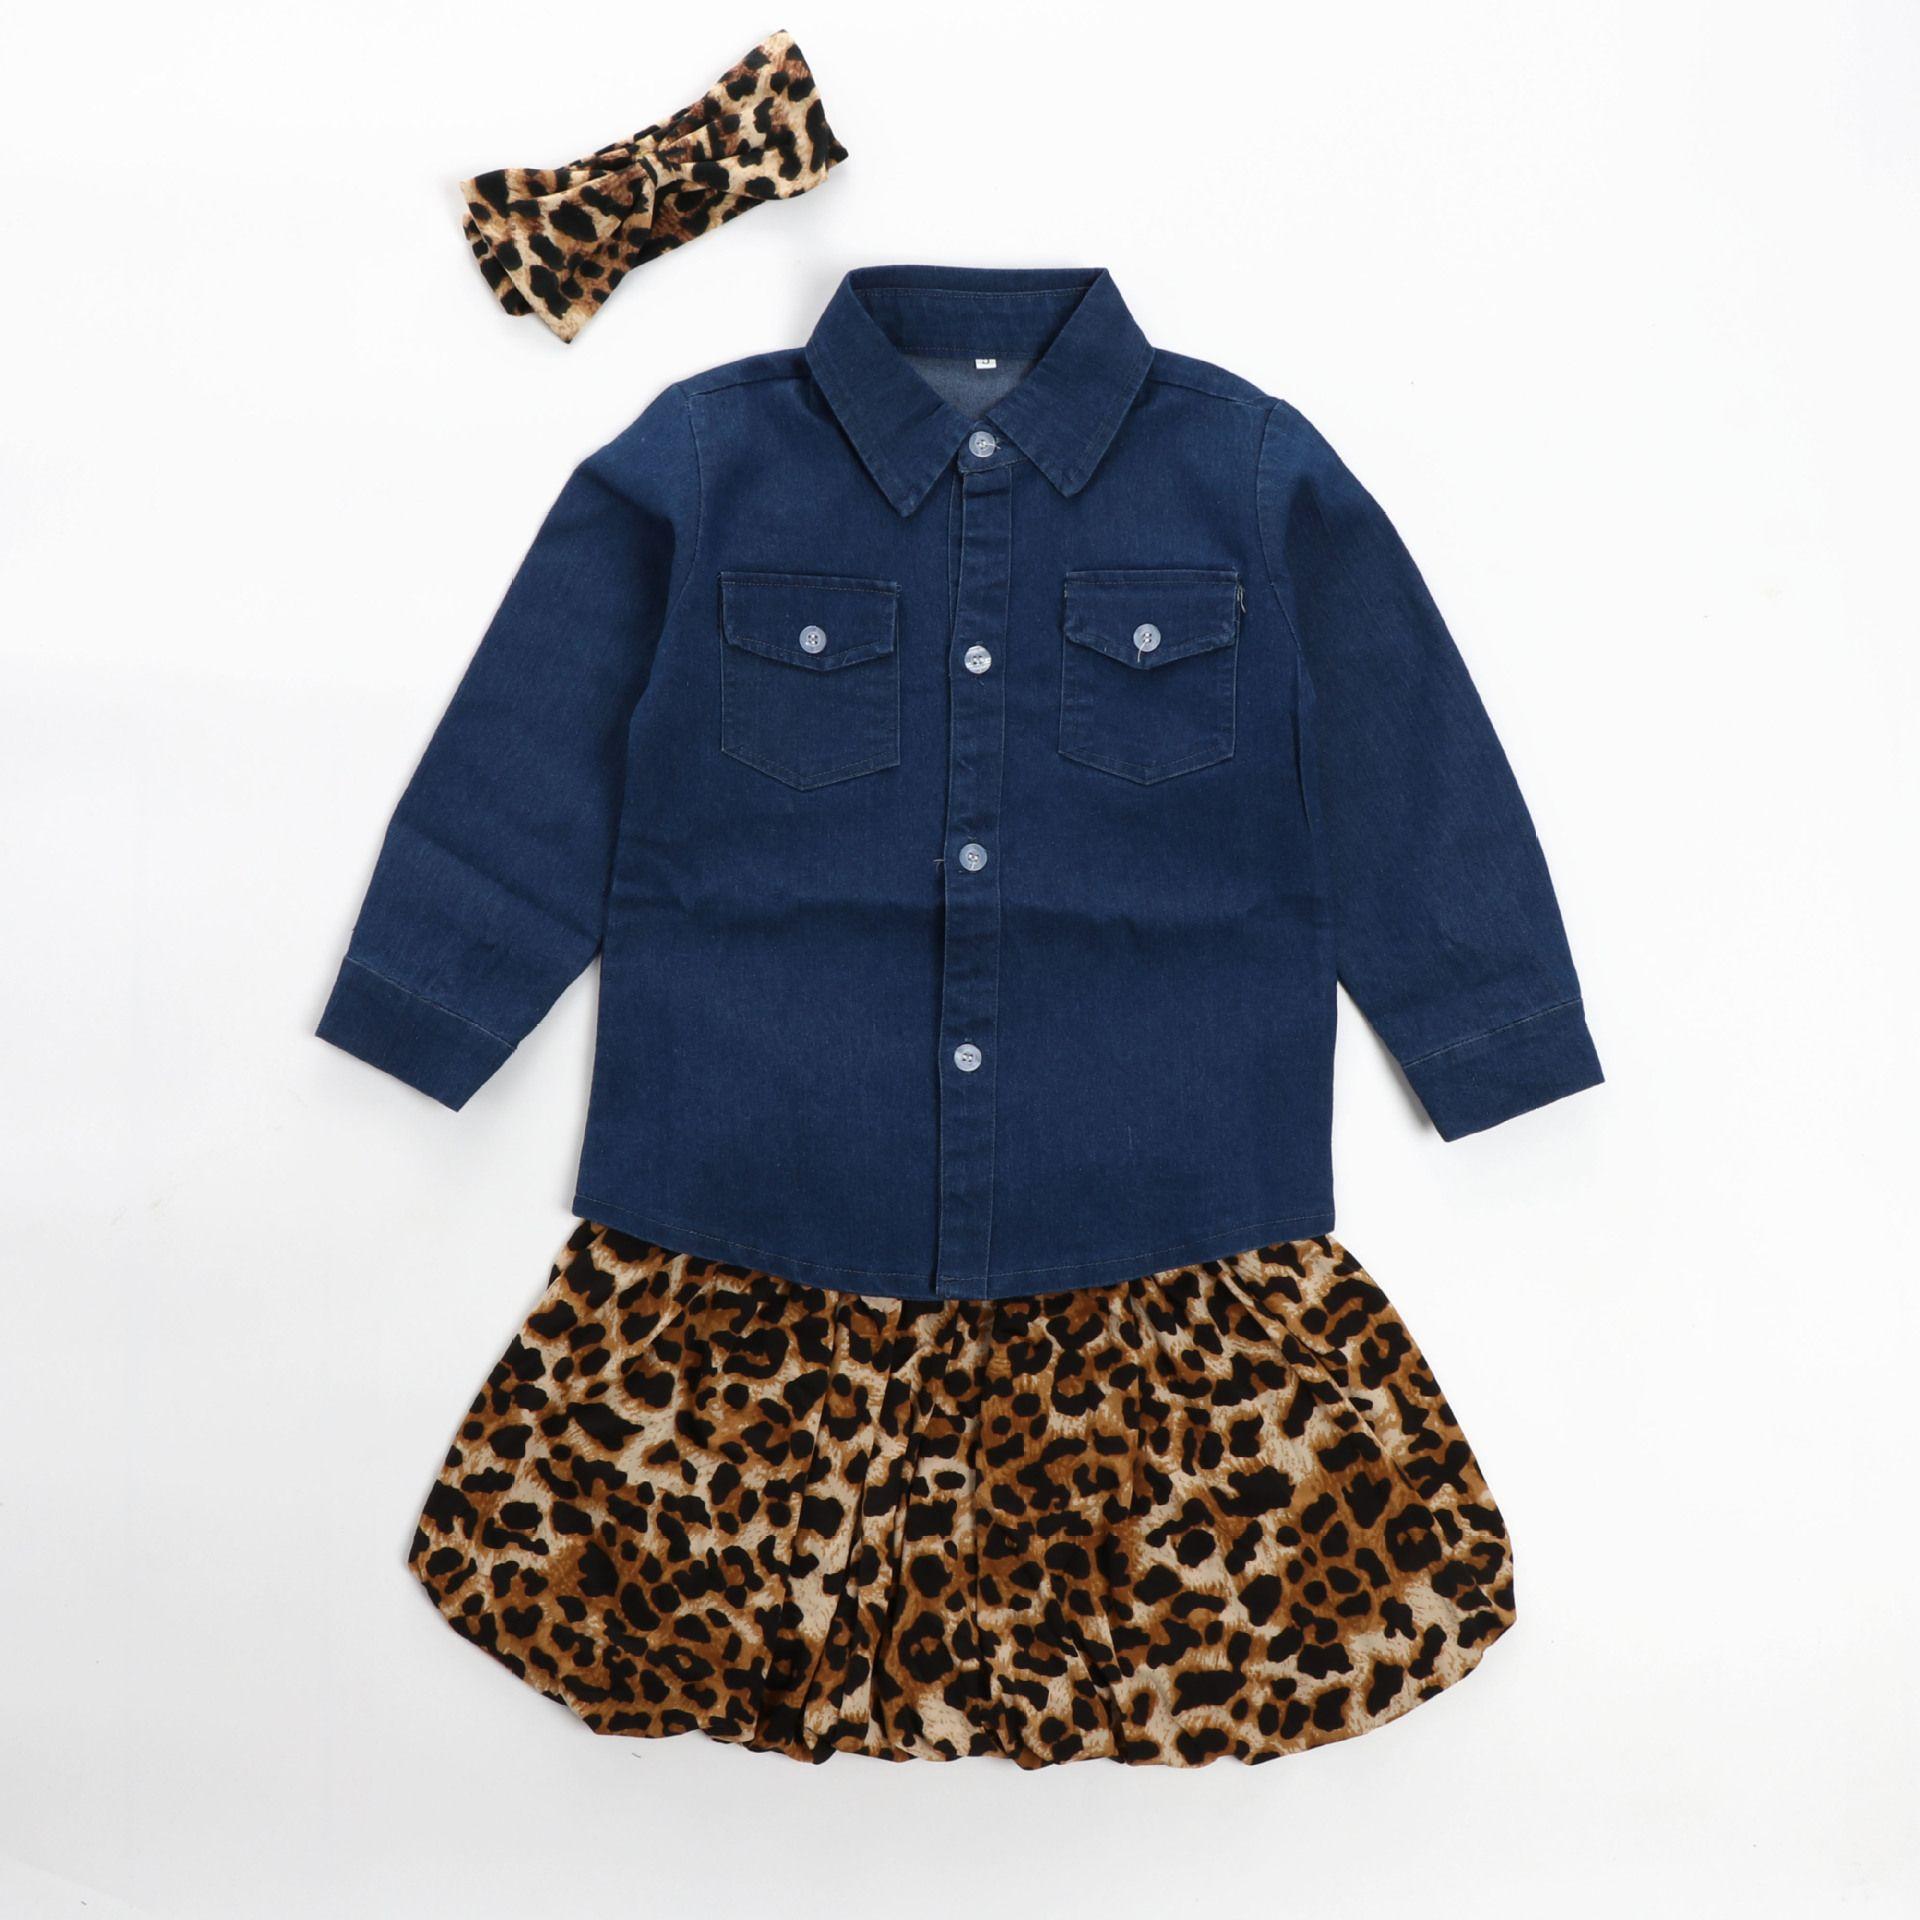 2017 New Child Girls Clothing Suit Kids Baby Denim Shirt + Leopard Skirt + Headband Children Outfits Girl Set 3064